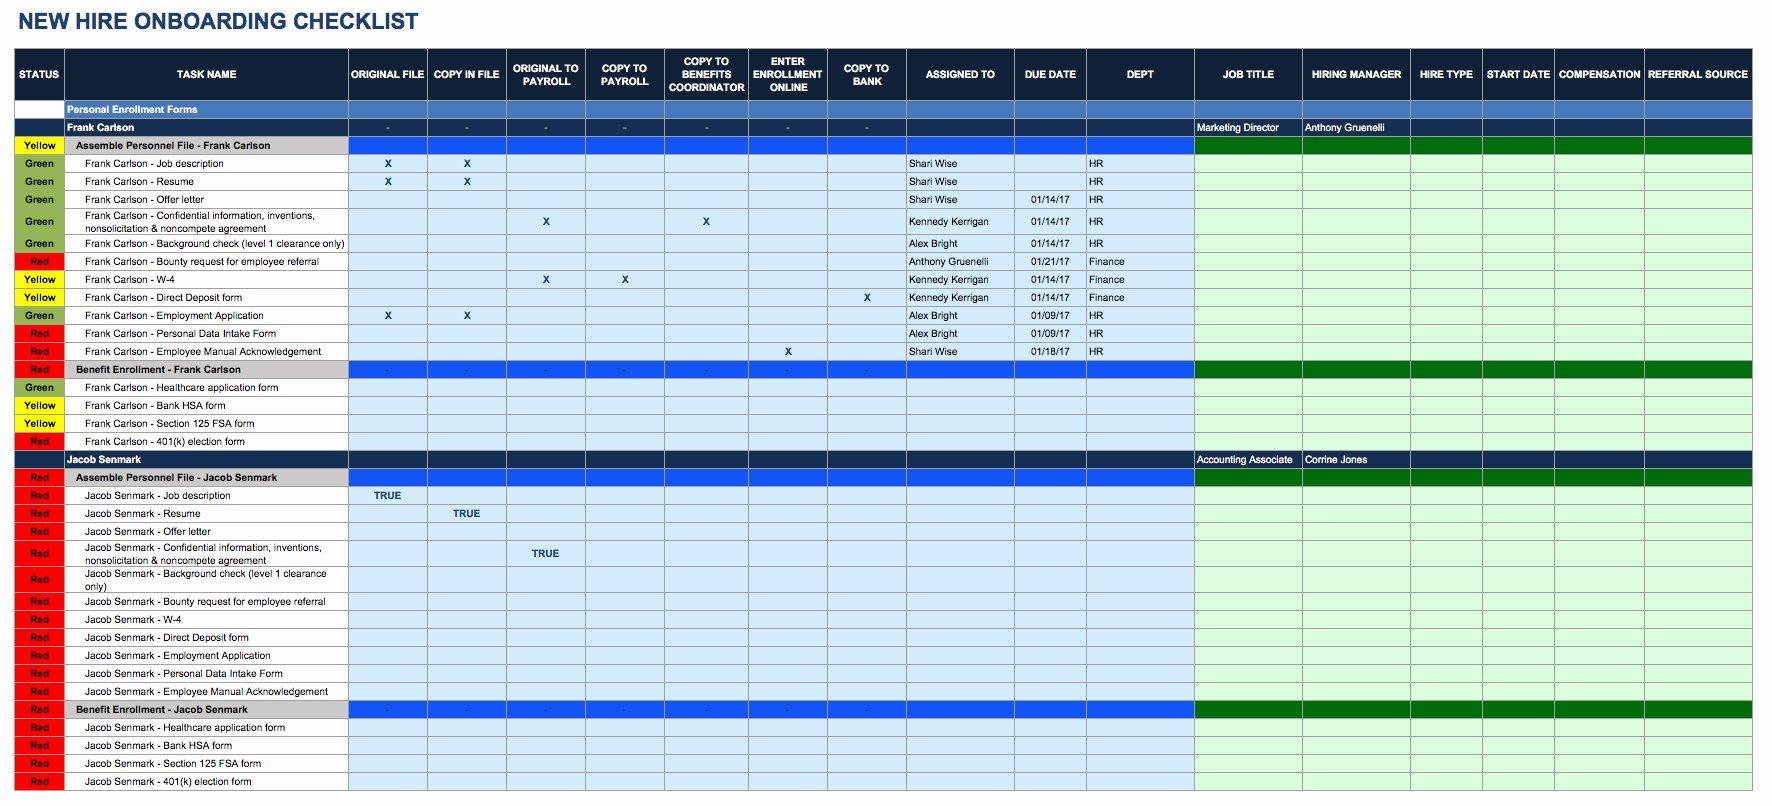 Employee Training Matrix Template Excel Fresh Employee Training Spreadsheet Template Intended for Free Excel Training Free Excel Training